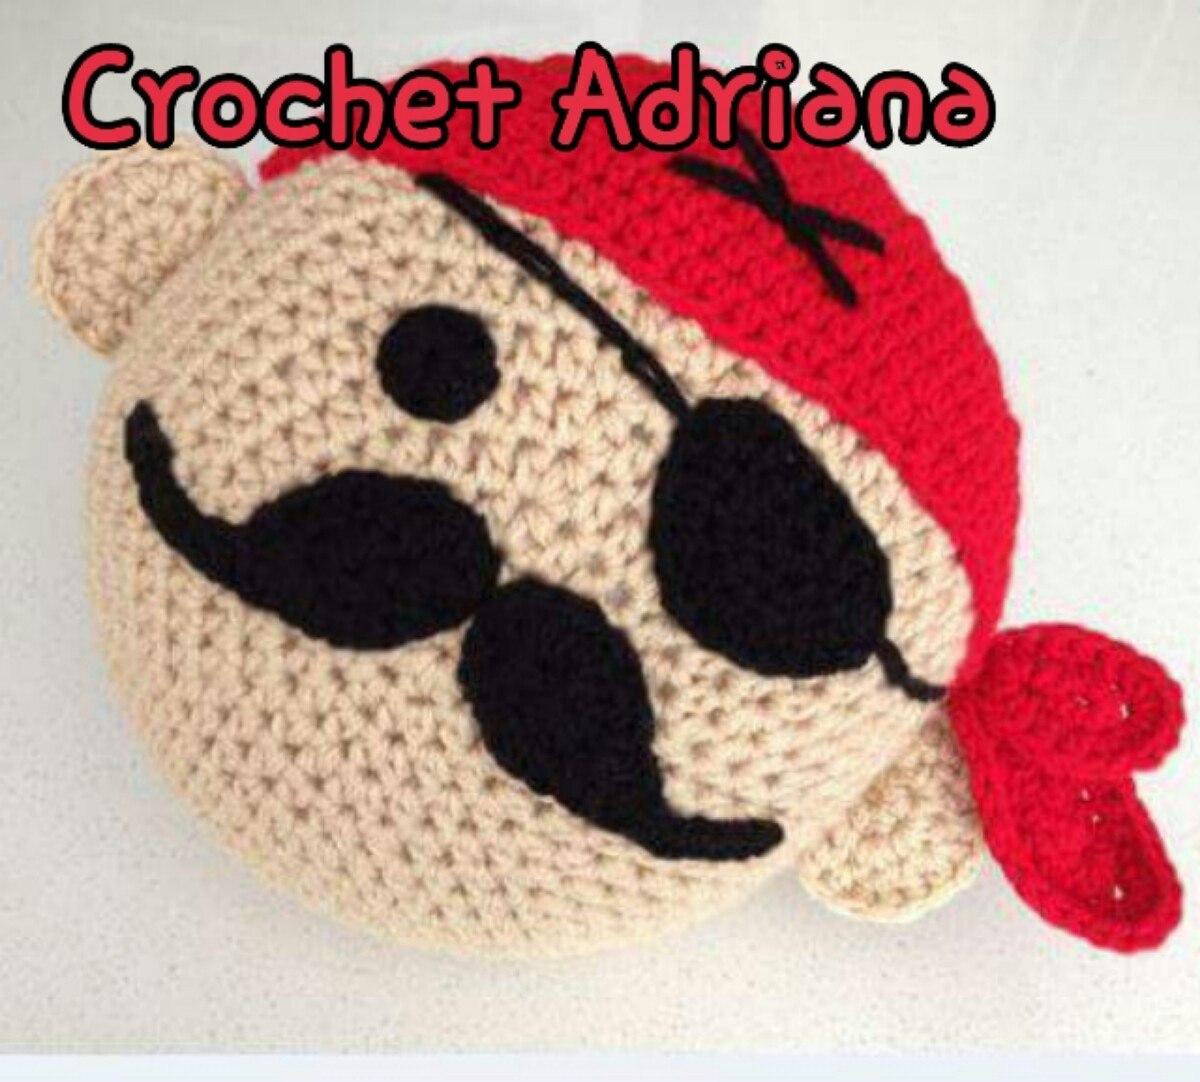 Cojín Crochet Tejido Koala Panda Gato Buho - $ 1,200.00 en Mercado Libre